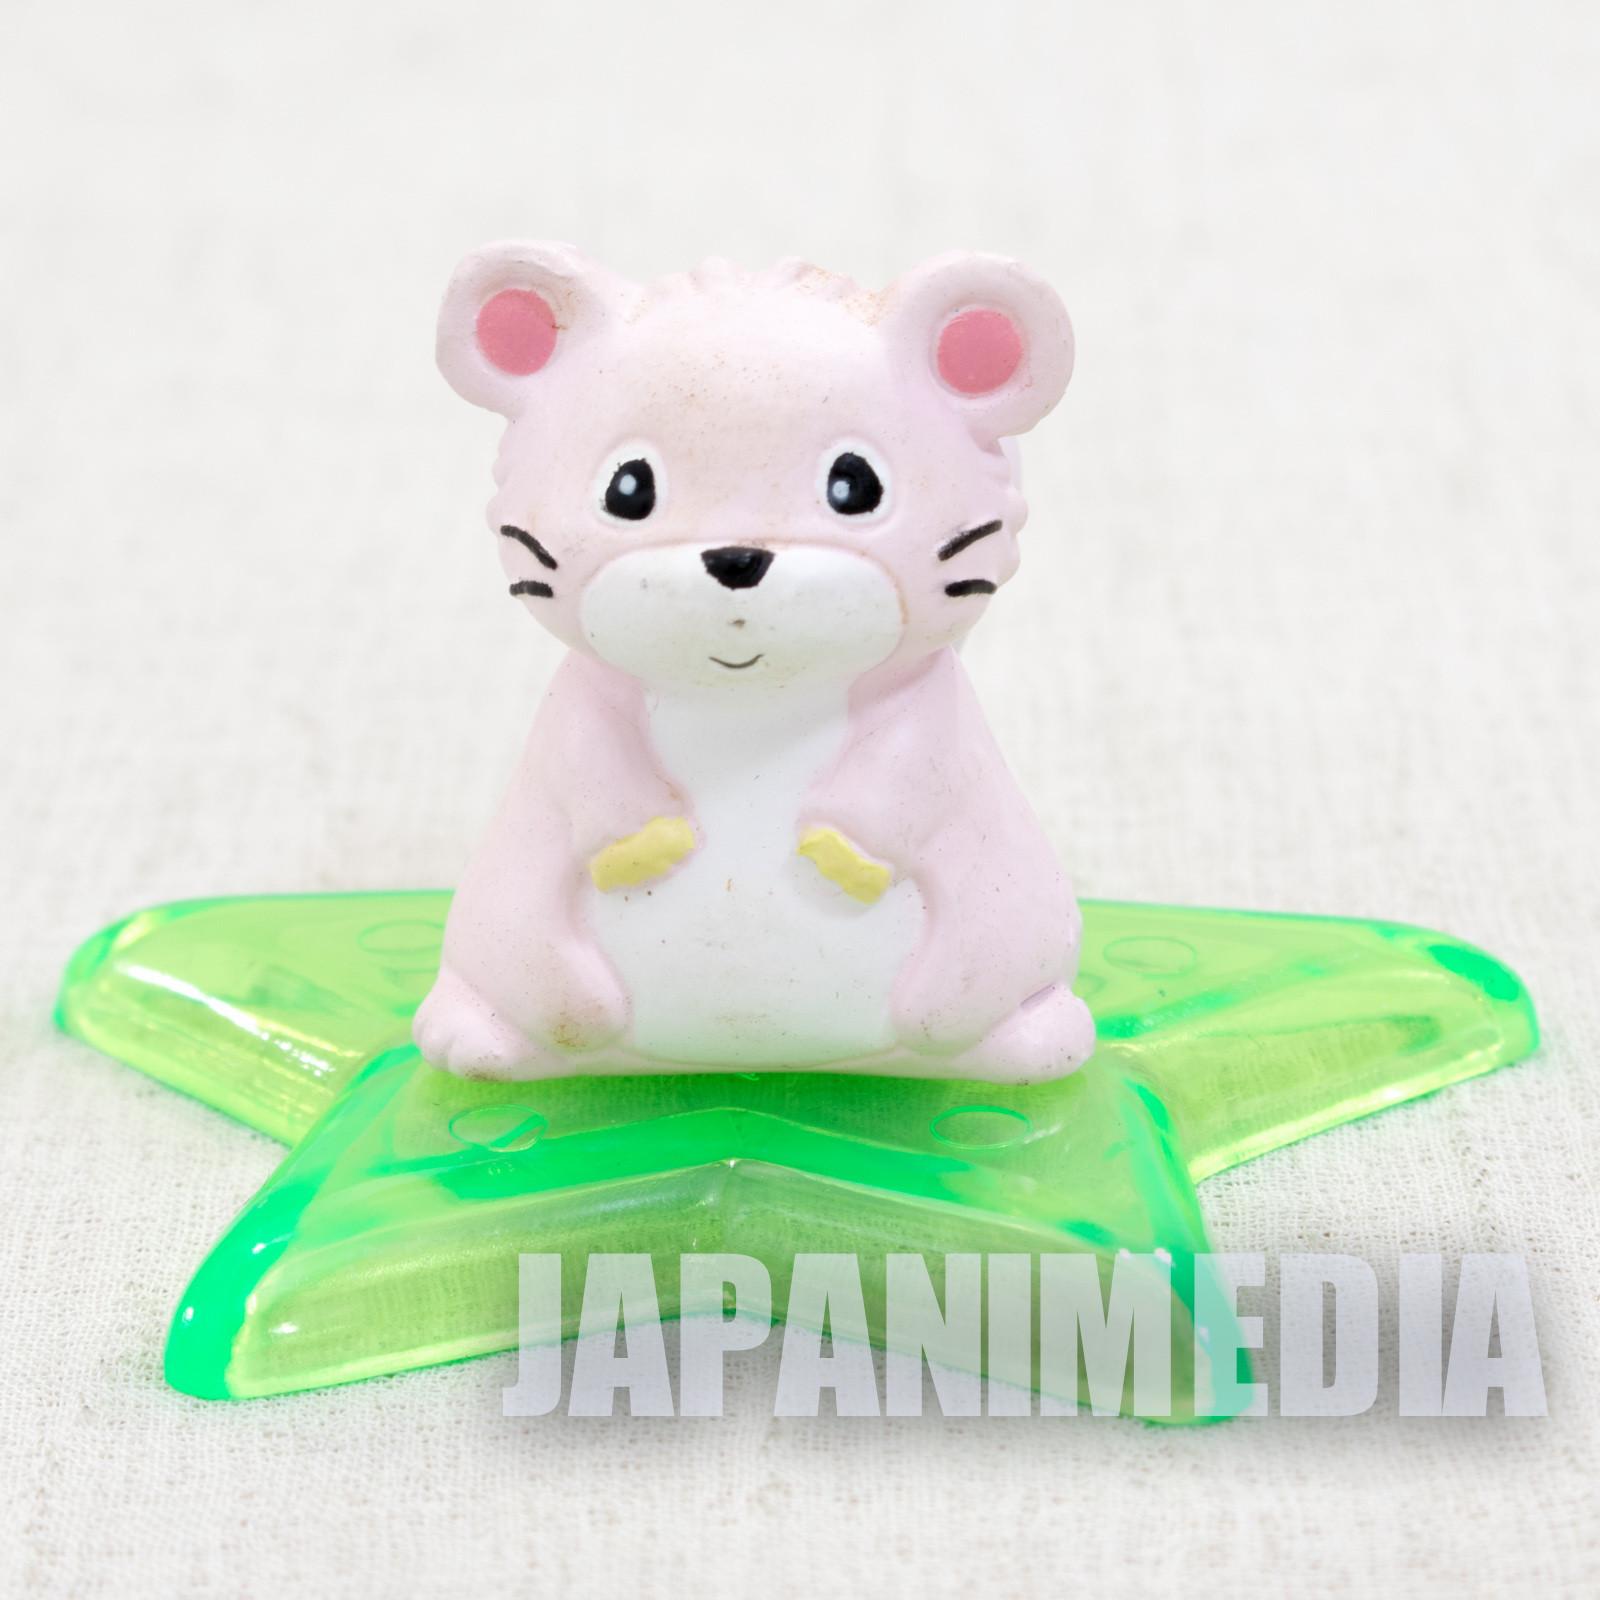 Magical Emi, Magical Star Topo Magical girl Collection Mini Figure Part 2 JAPAN ANIME